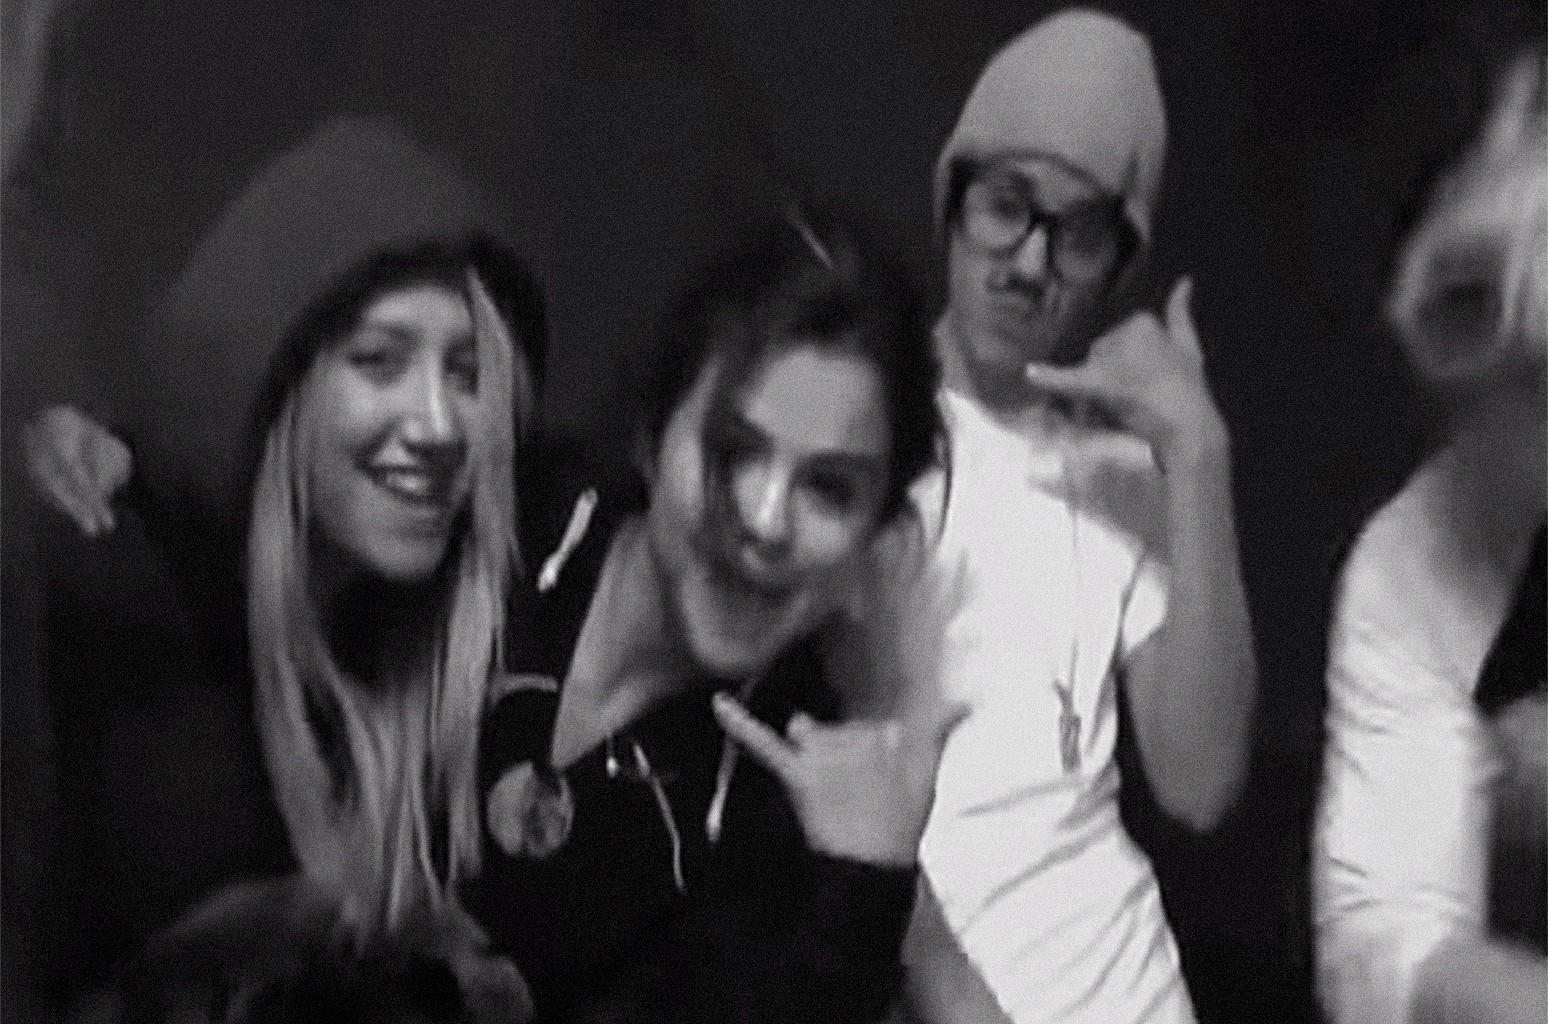 Ashley Tisdale, Selena Gomez and Justin Bieber